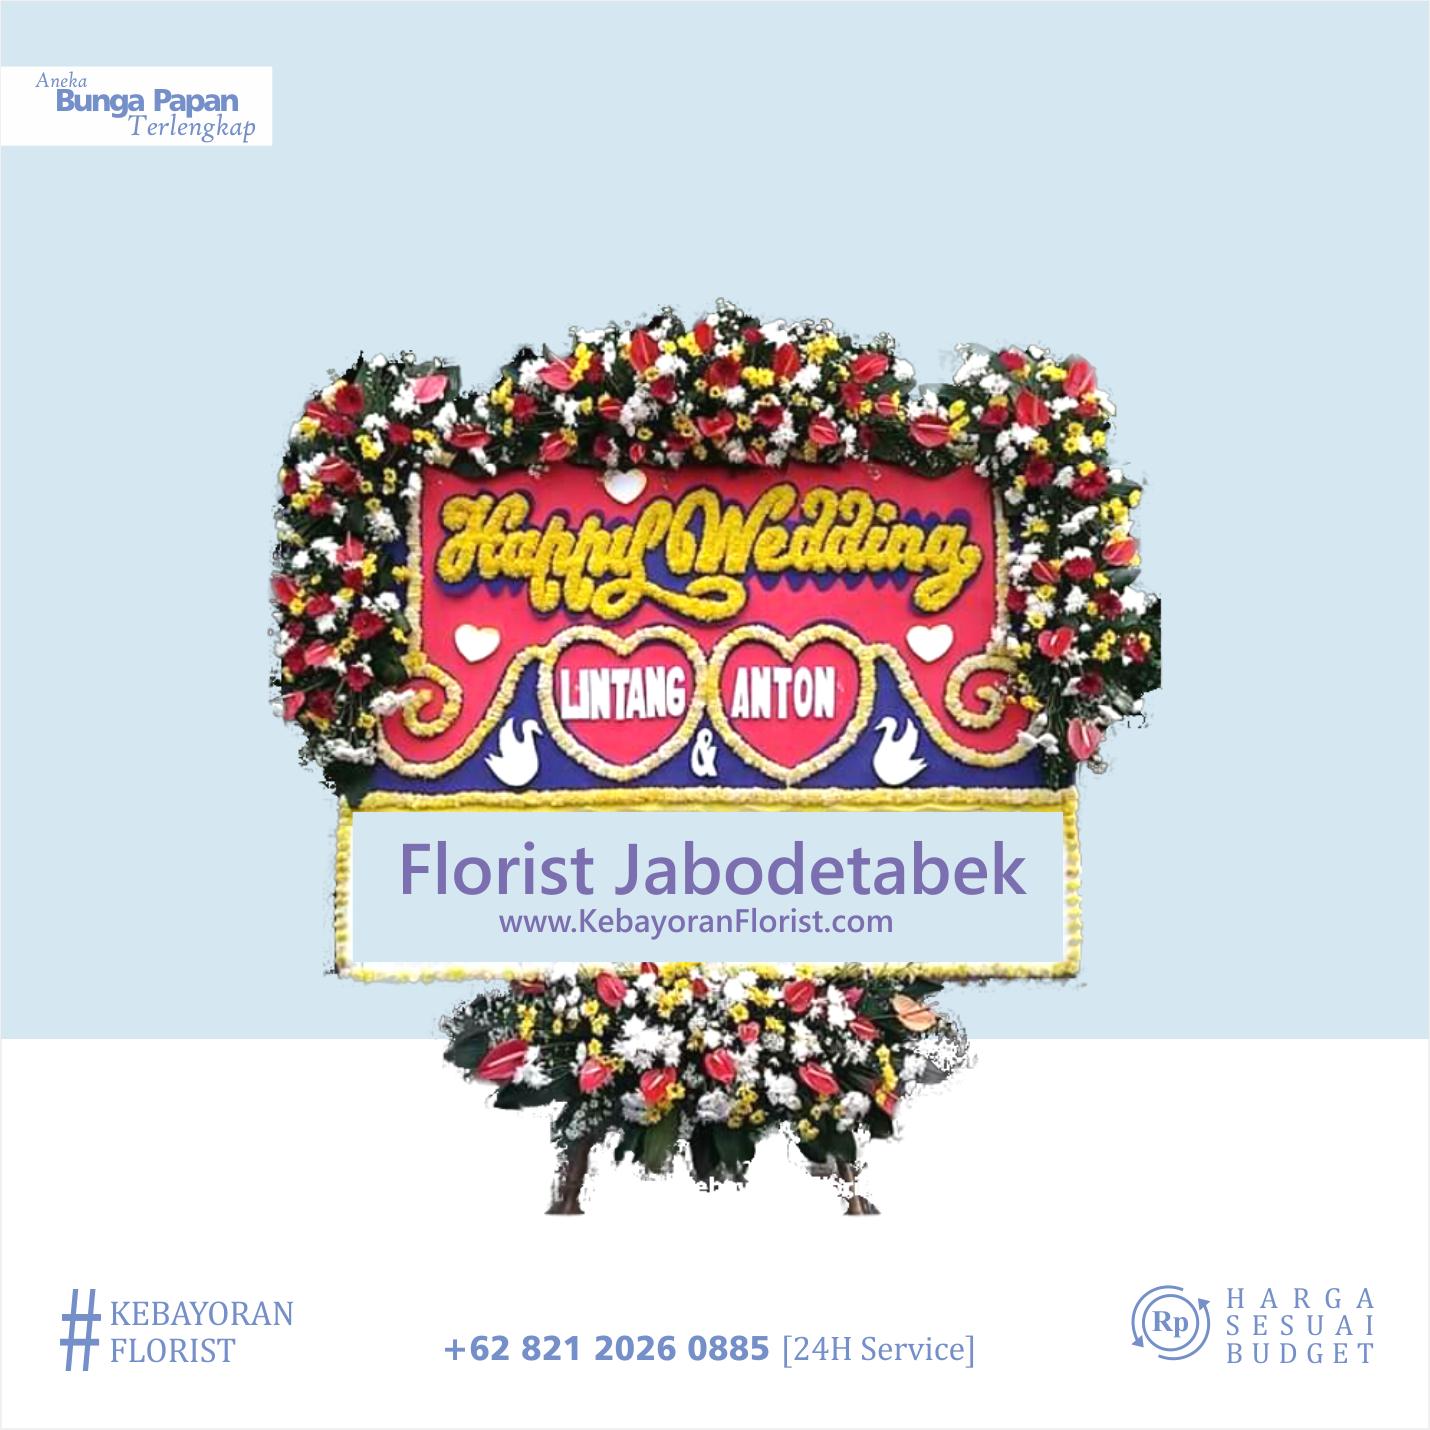 toko bunga papan jakarta selatan kebayoran florist 2019